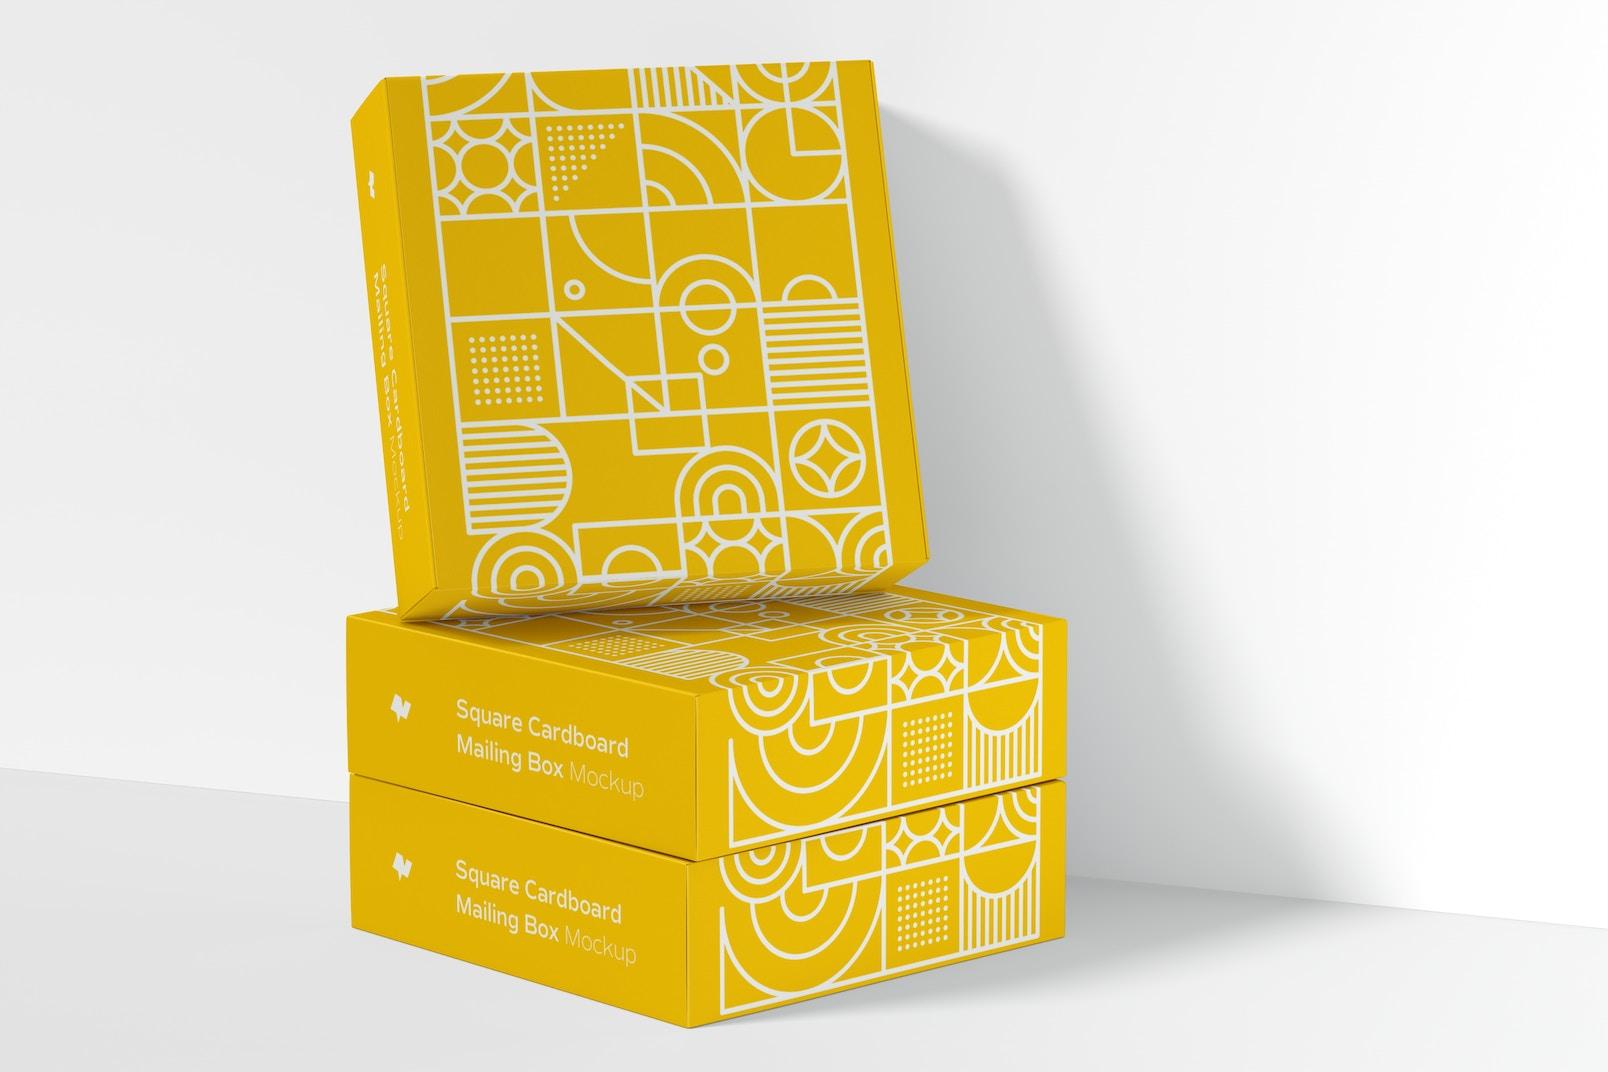 Square Cardboard Mailing Boxes Mockup, Closed